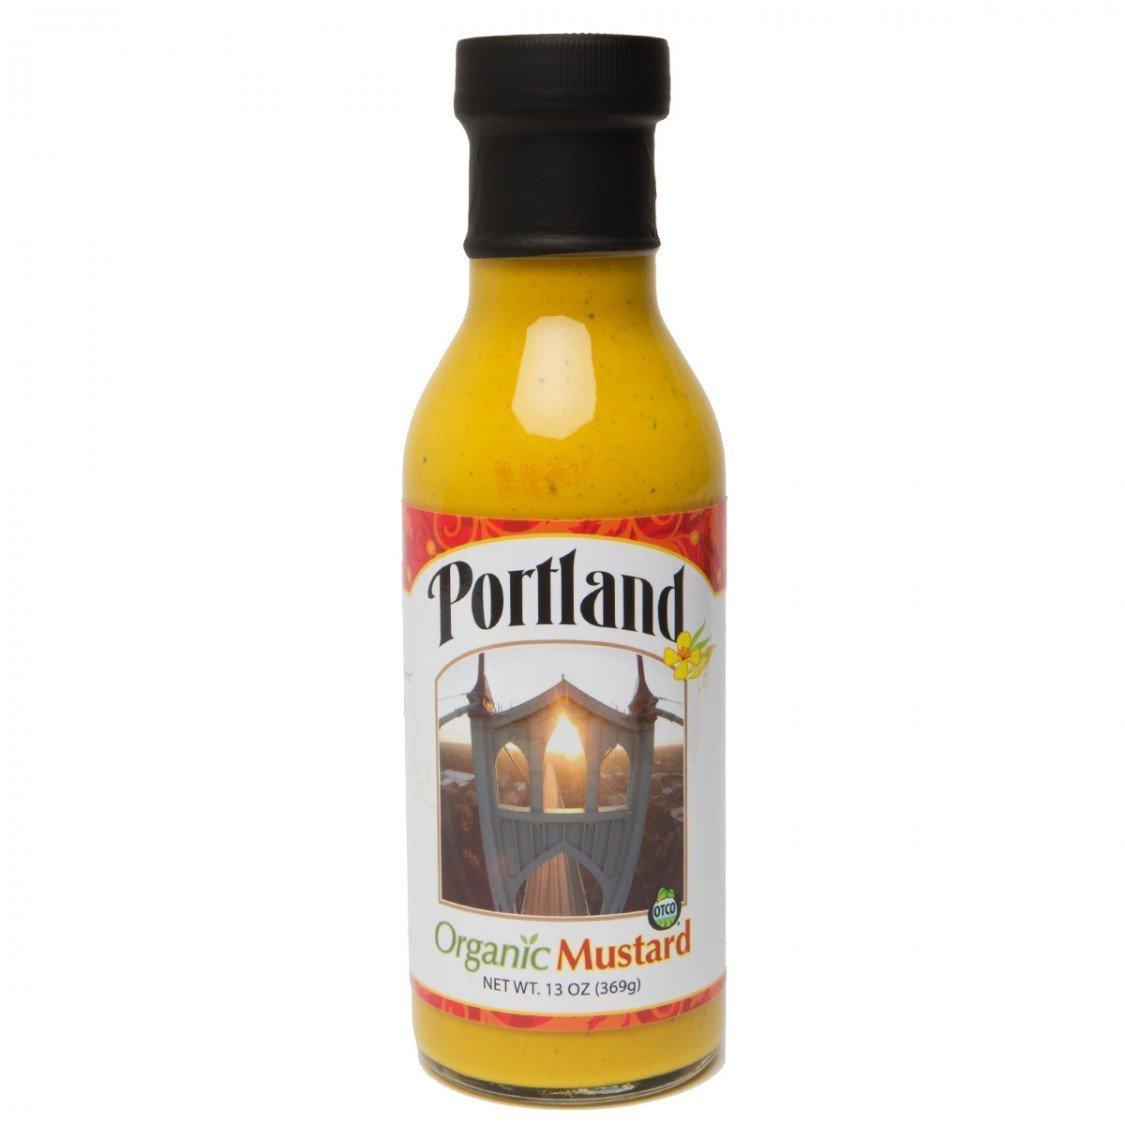 Portland Organic Mustard, Paleo Approved, 13 Oz